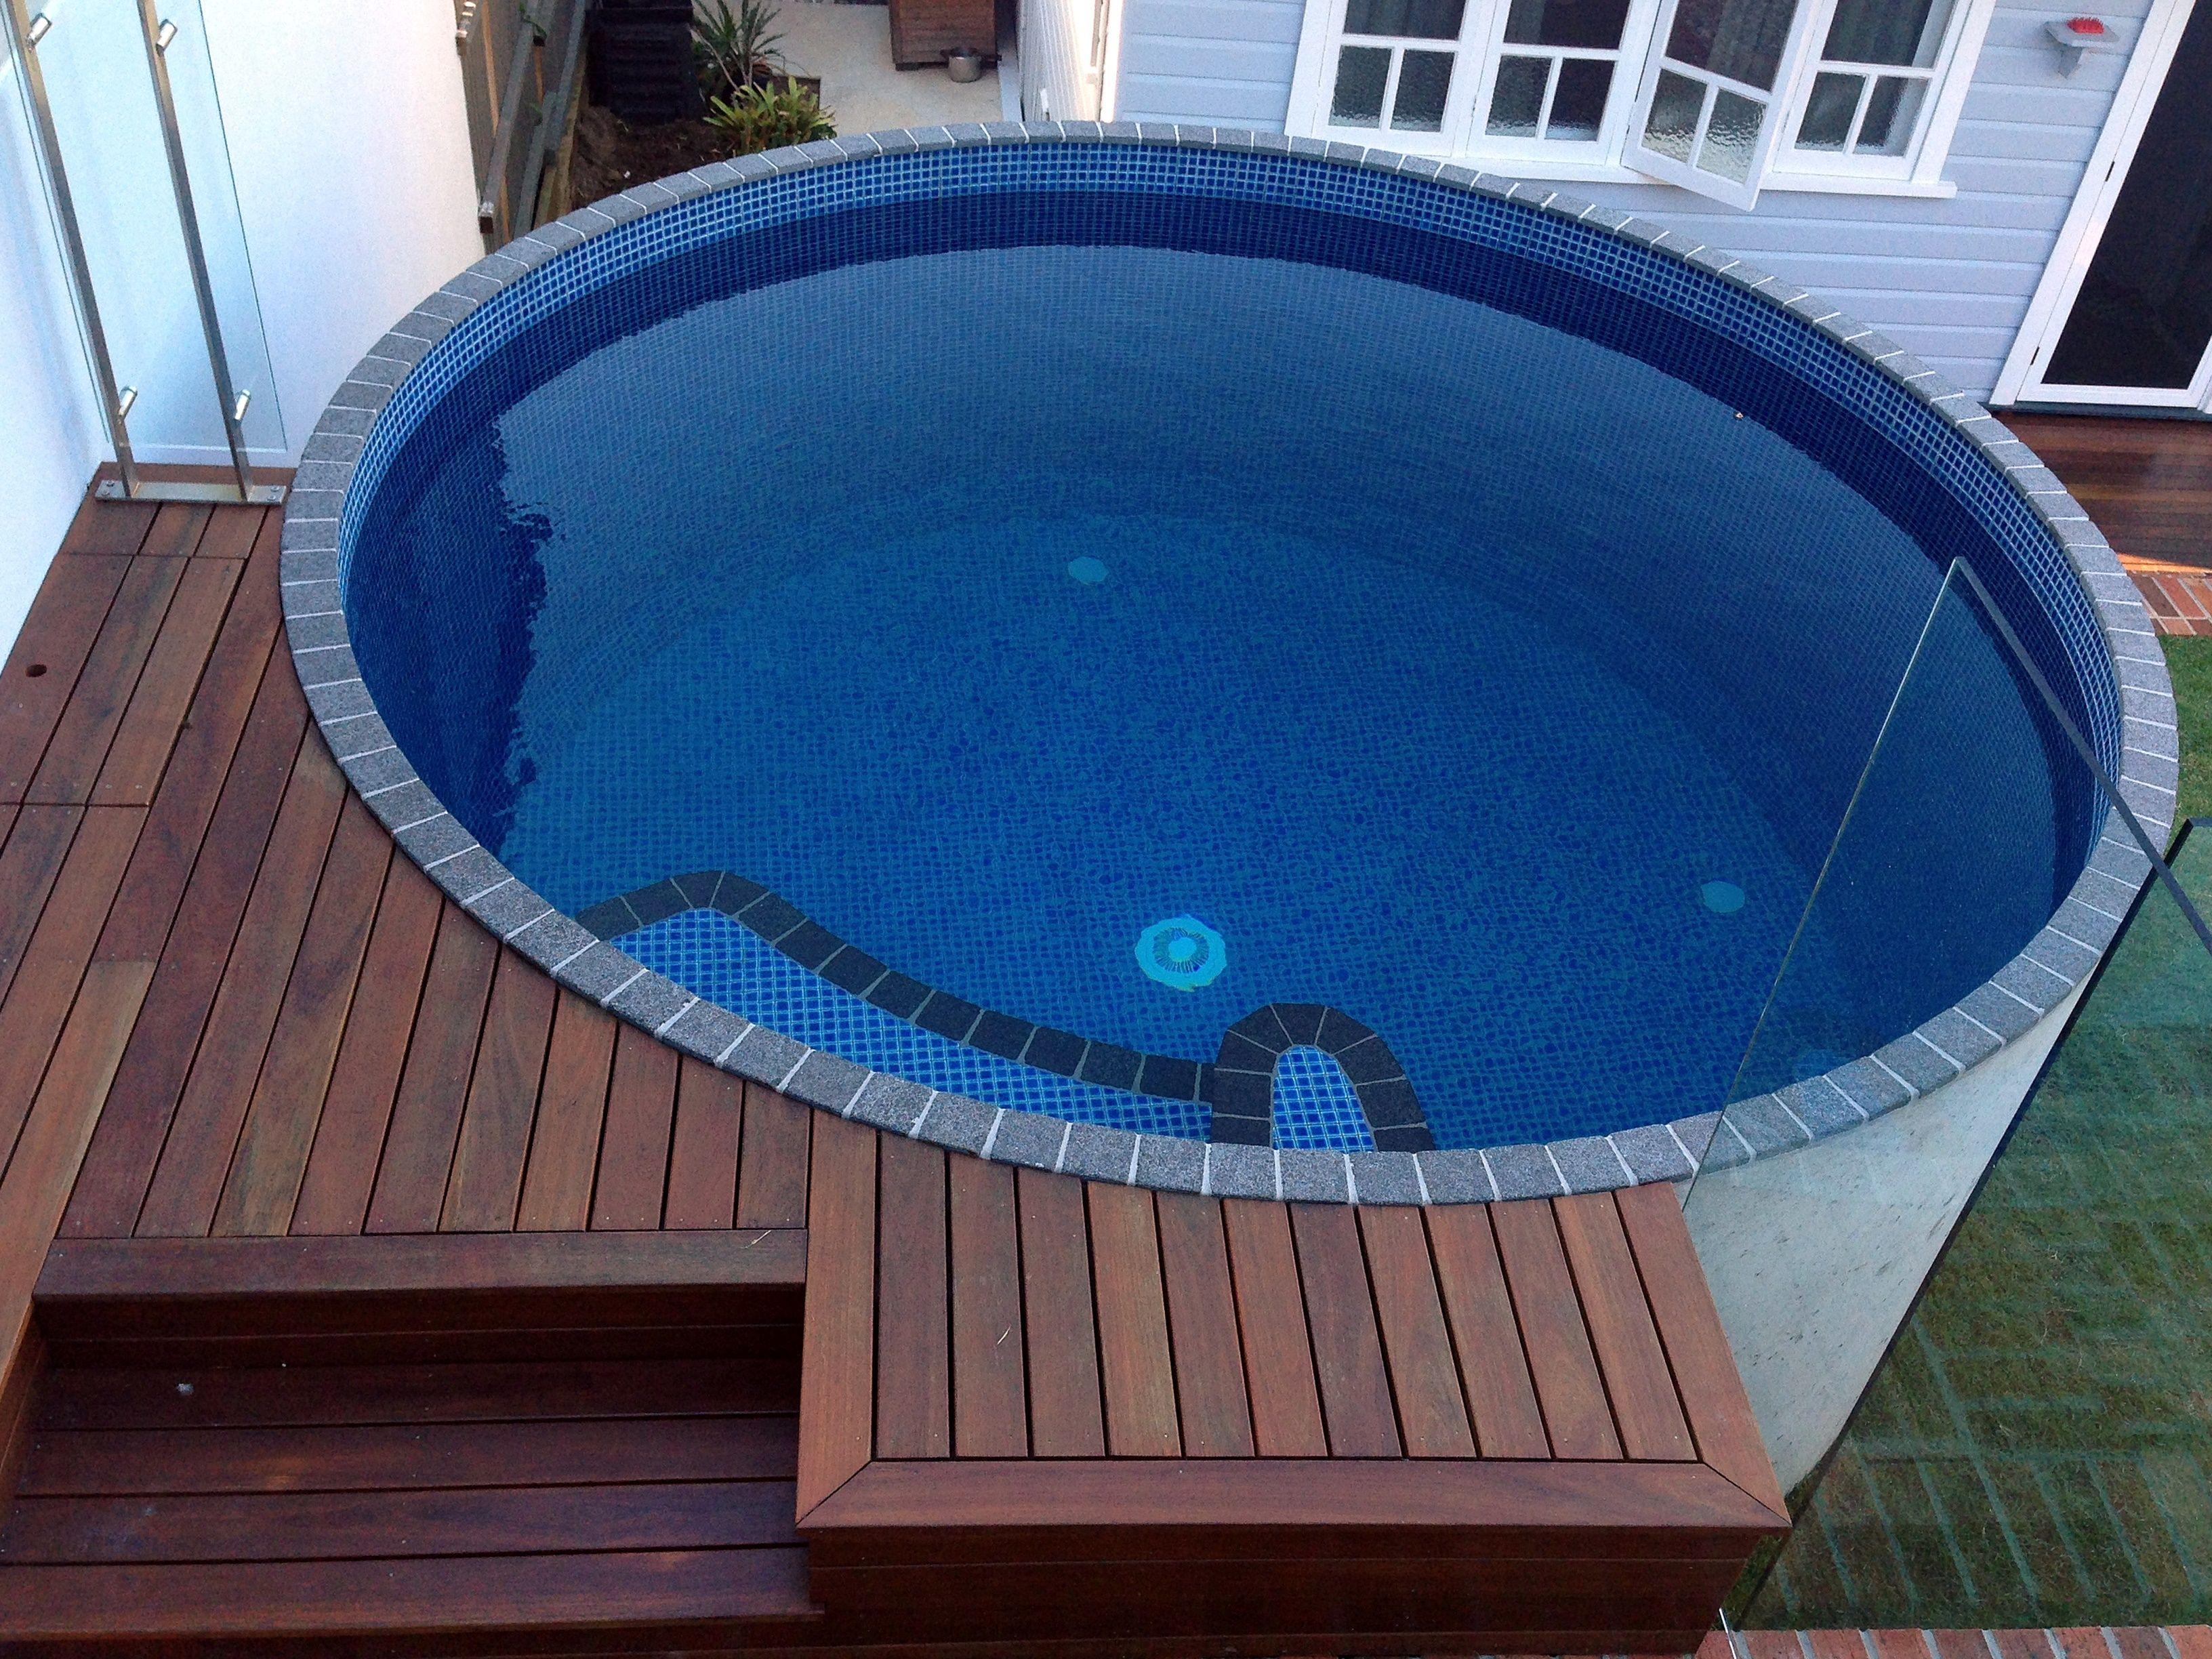 Brisbane Australian Plunge Pool Small Backyard Pools Small Pool